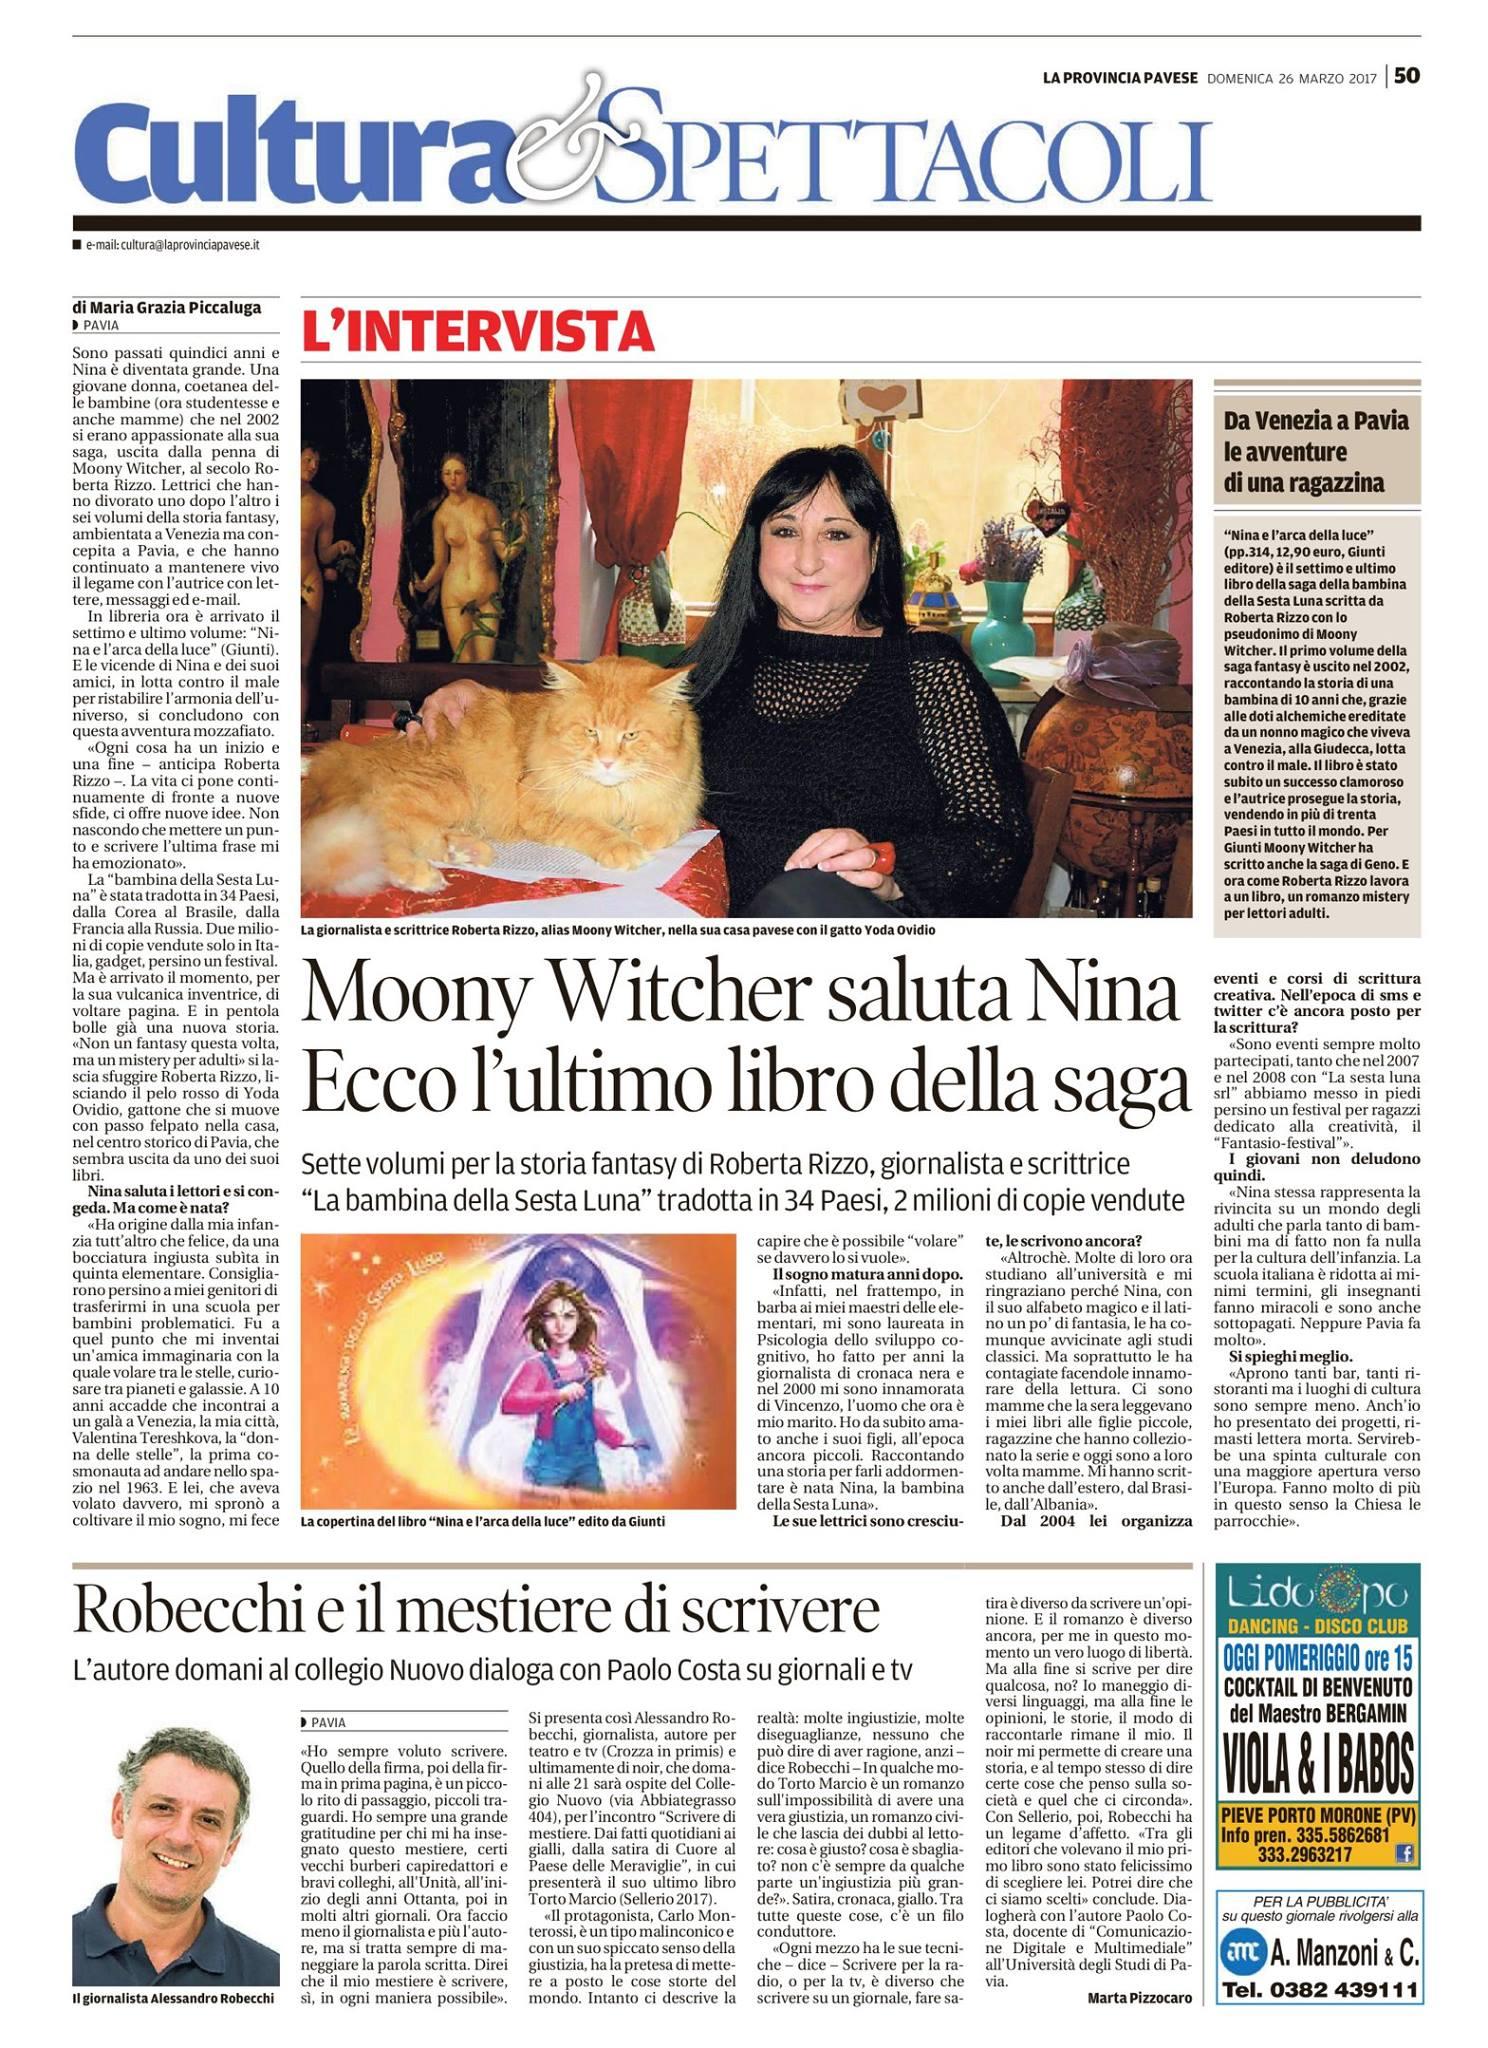 intervista a Moony Witcher su la Provincia Pavese